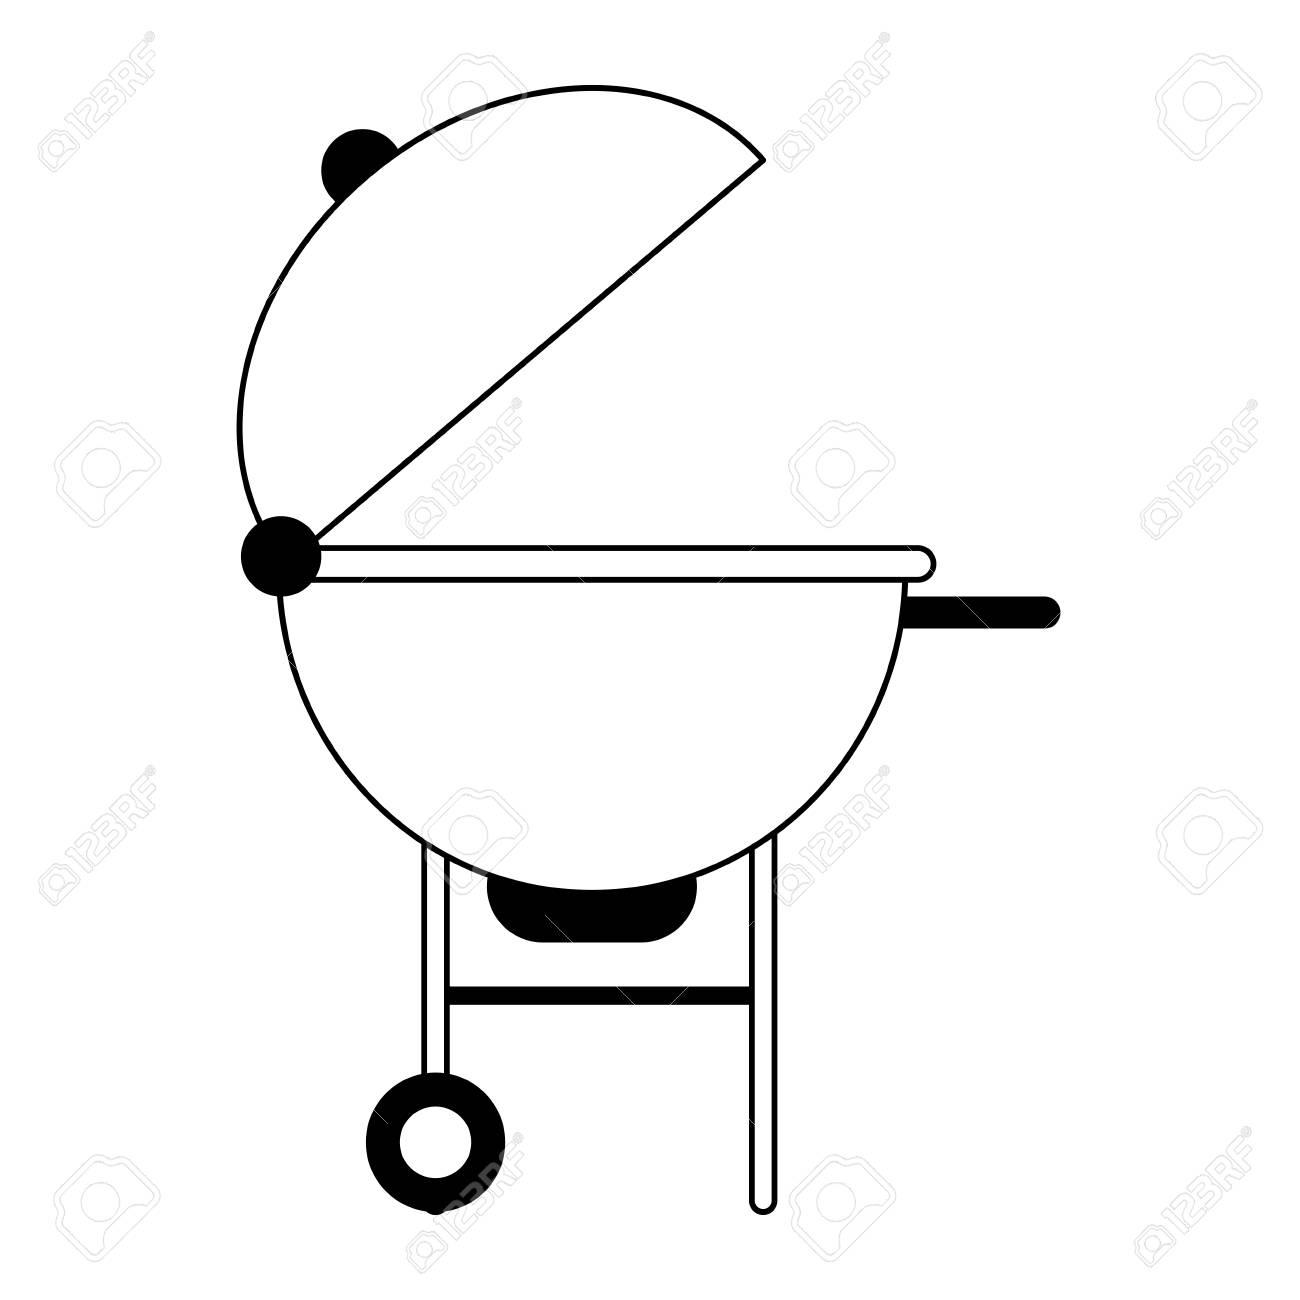 bbq grill icon image vector illustration design black and white.